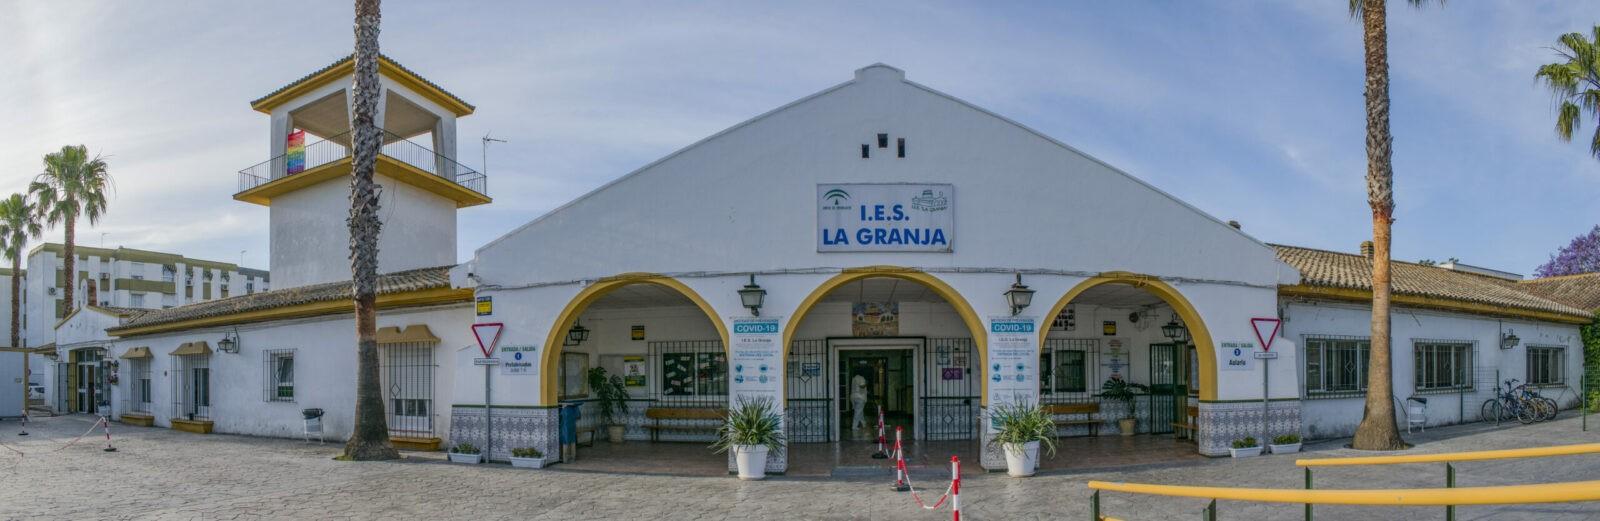 IES La Granja